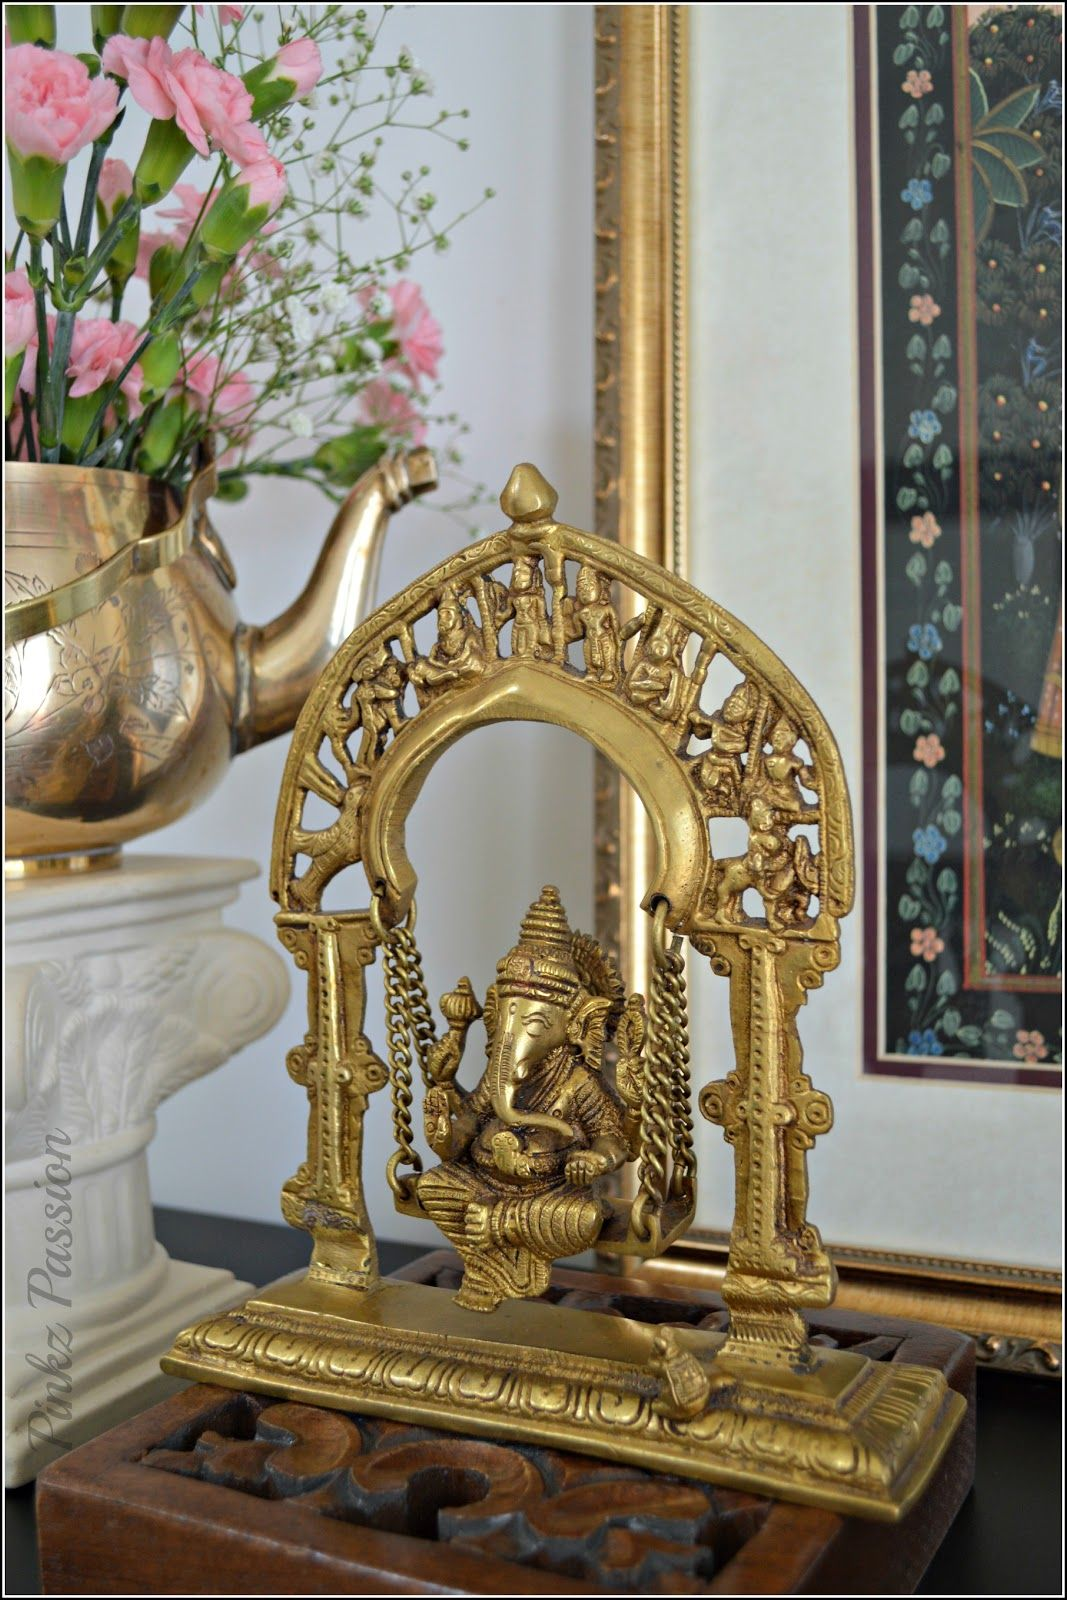 ashta lakshmi urli 6300 bronze statues indian handicrafts swing ganesha spring decor front foyer indian decor brass collections ganesha